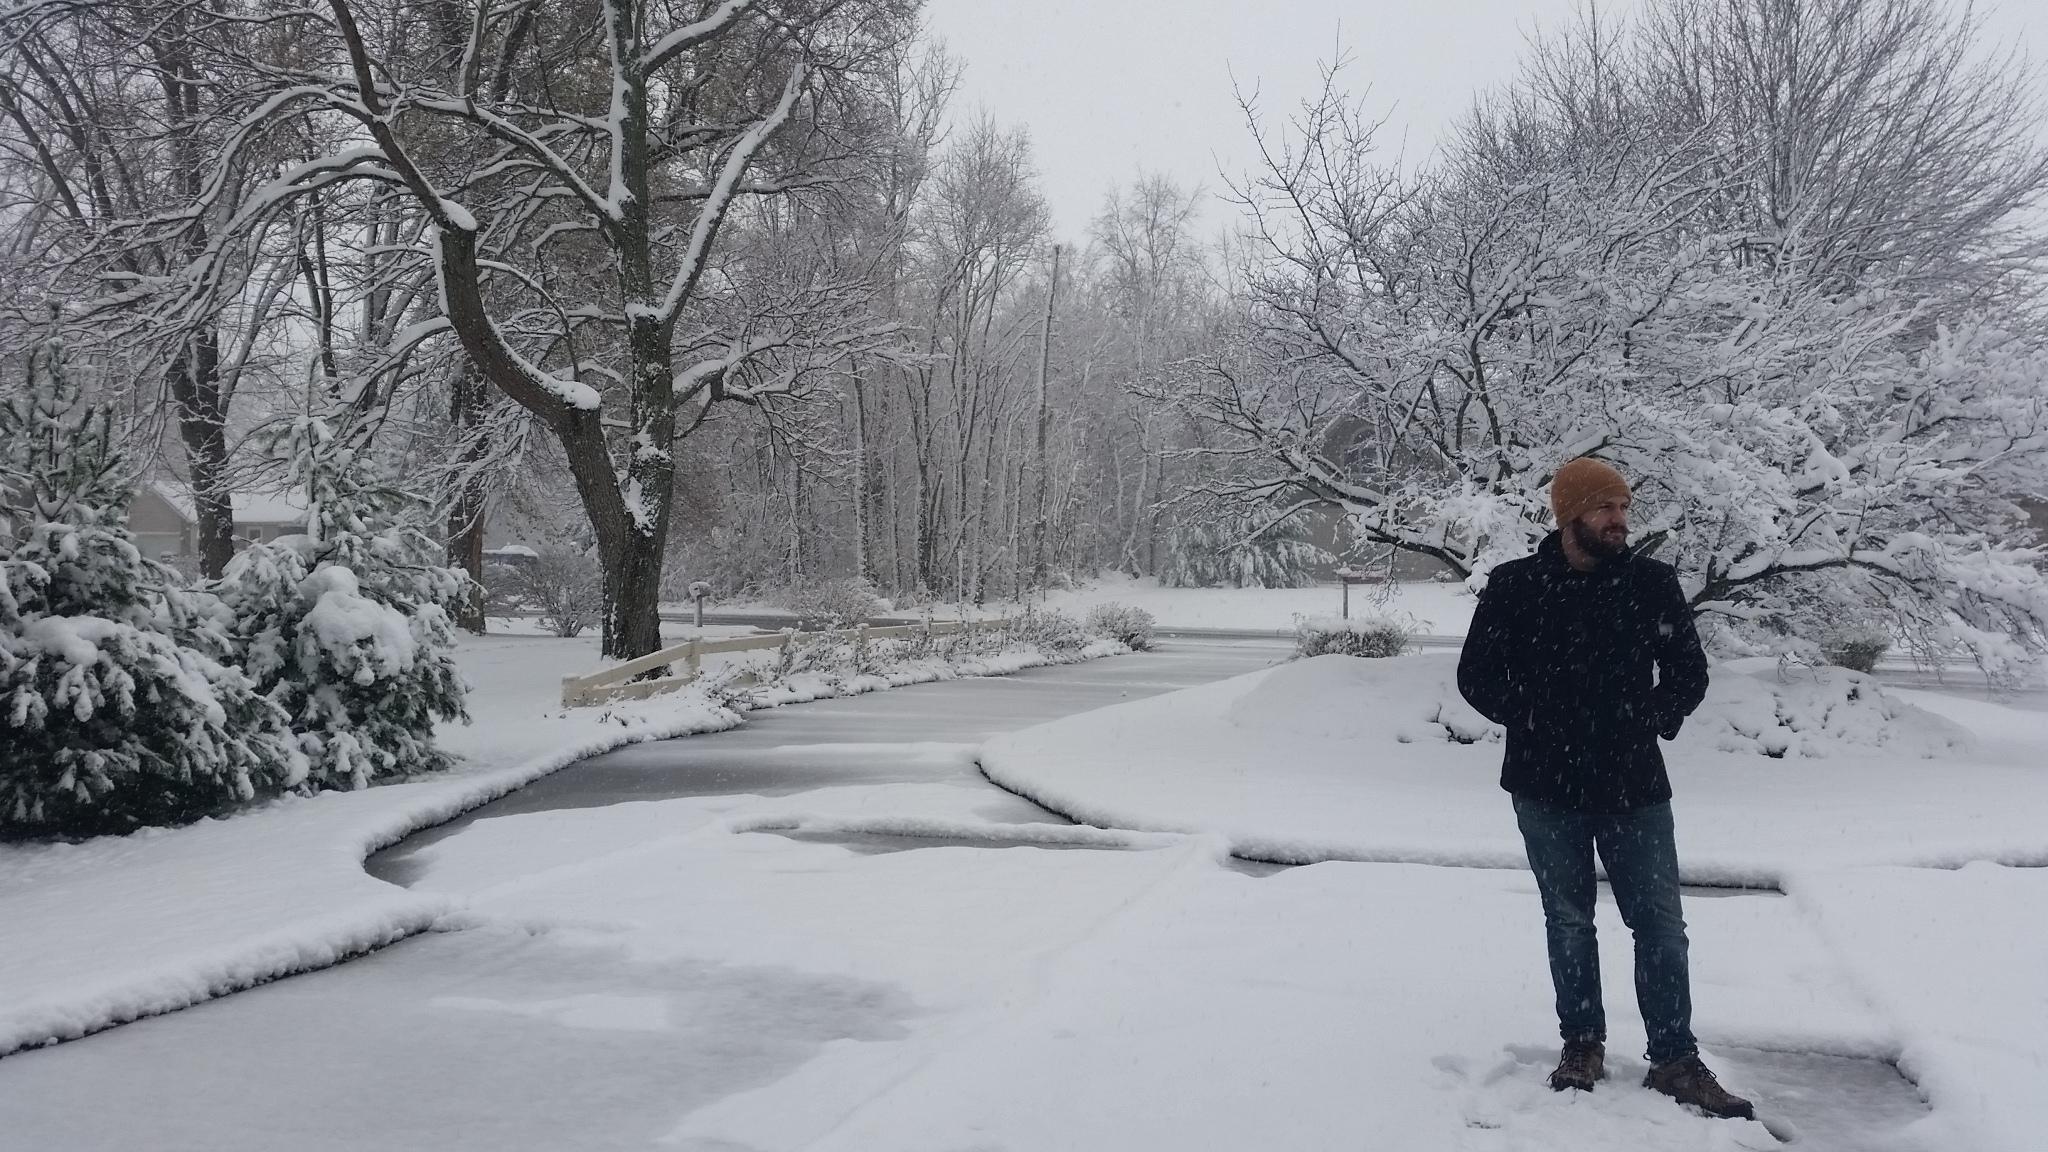 Jason's first snowy winter ever!